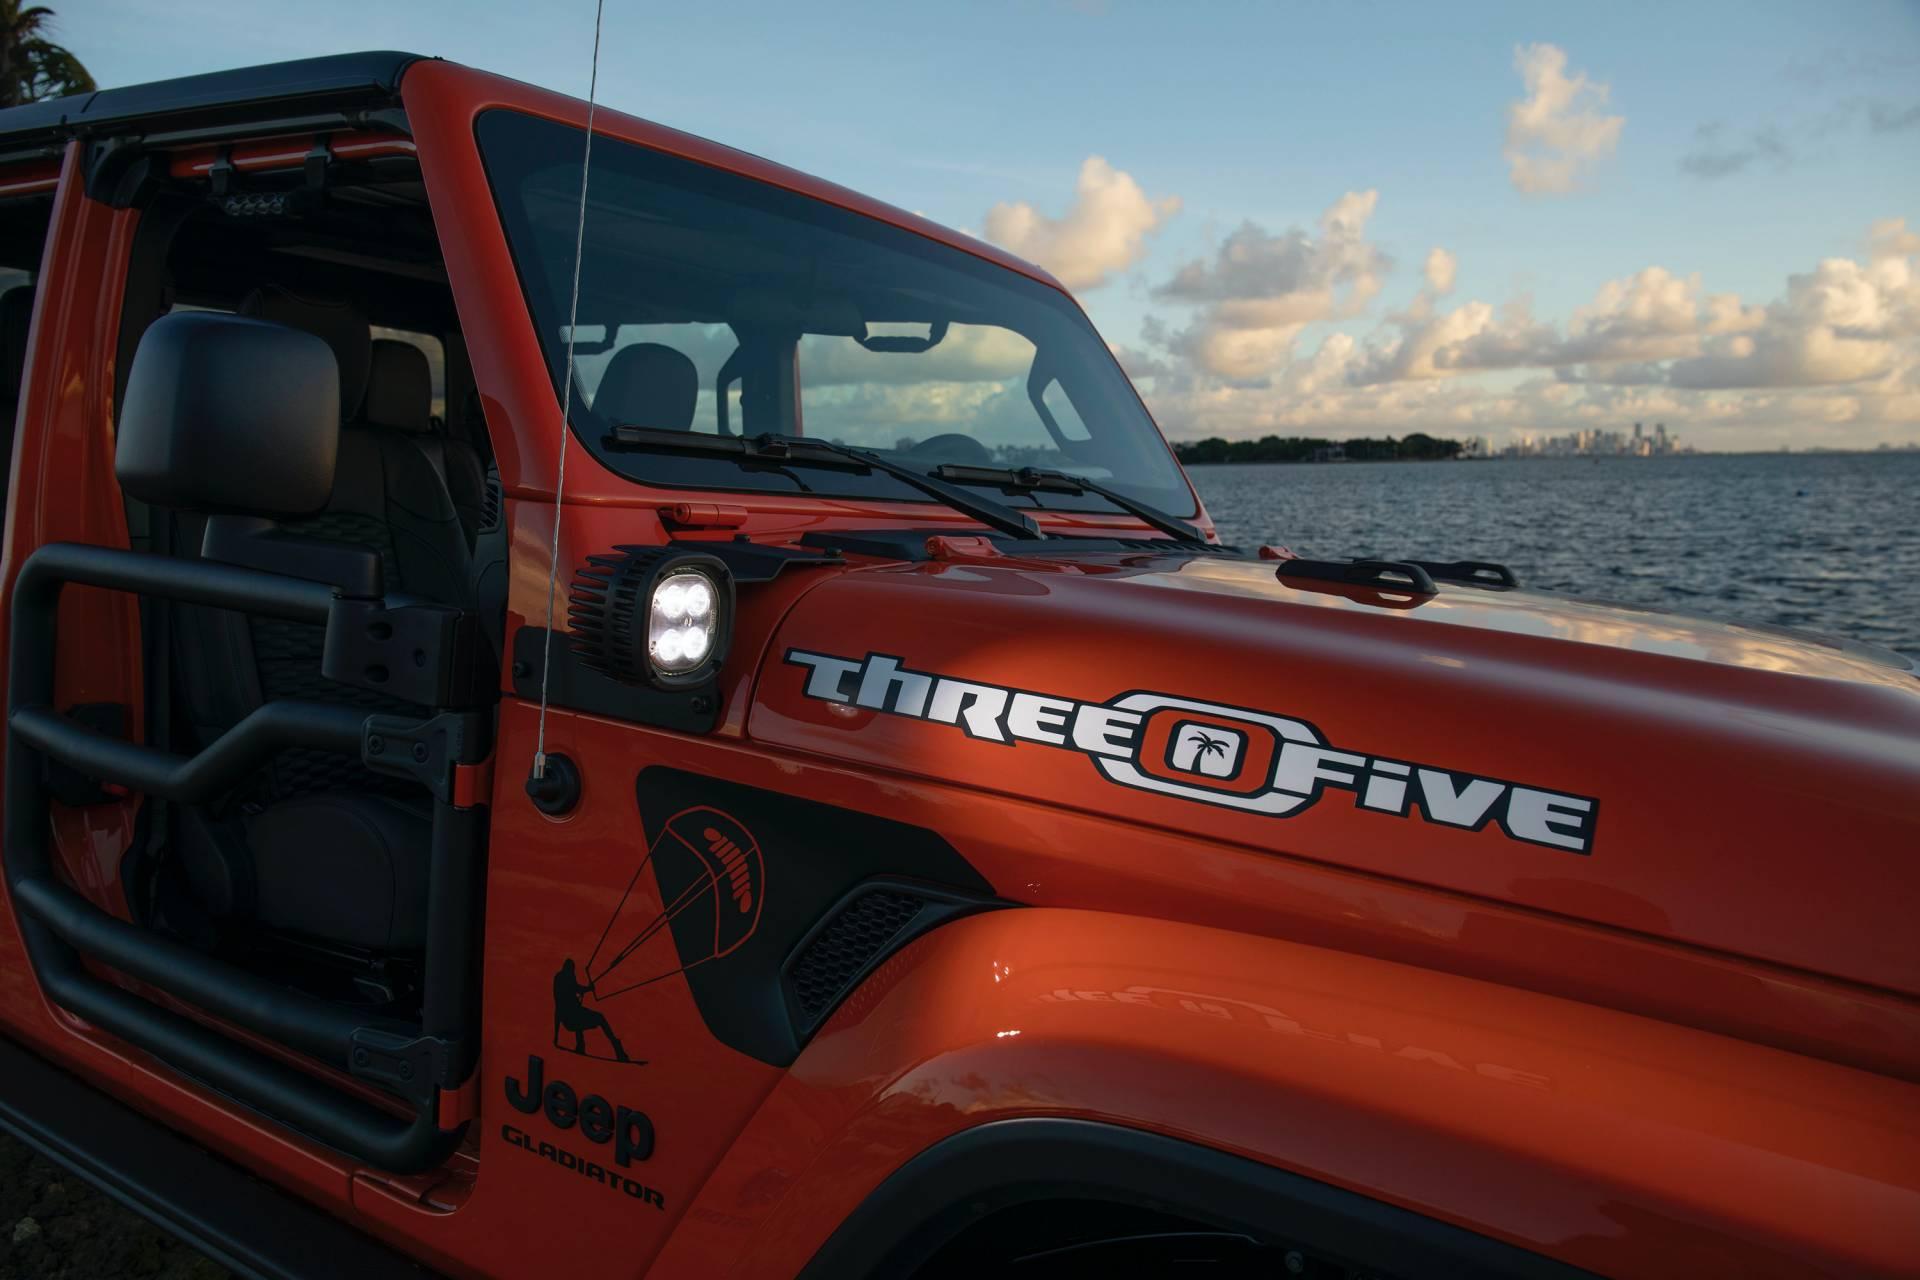 "2020-jeep-gladiator-""three-o-five""-edition-9"